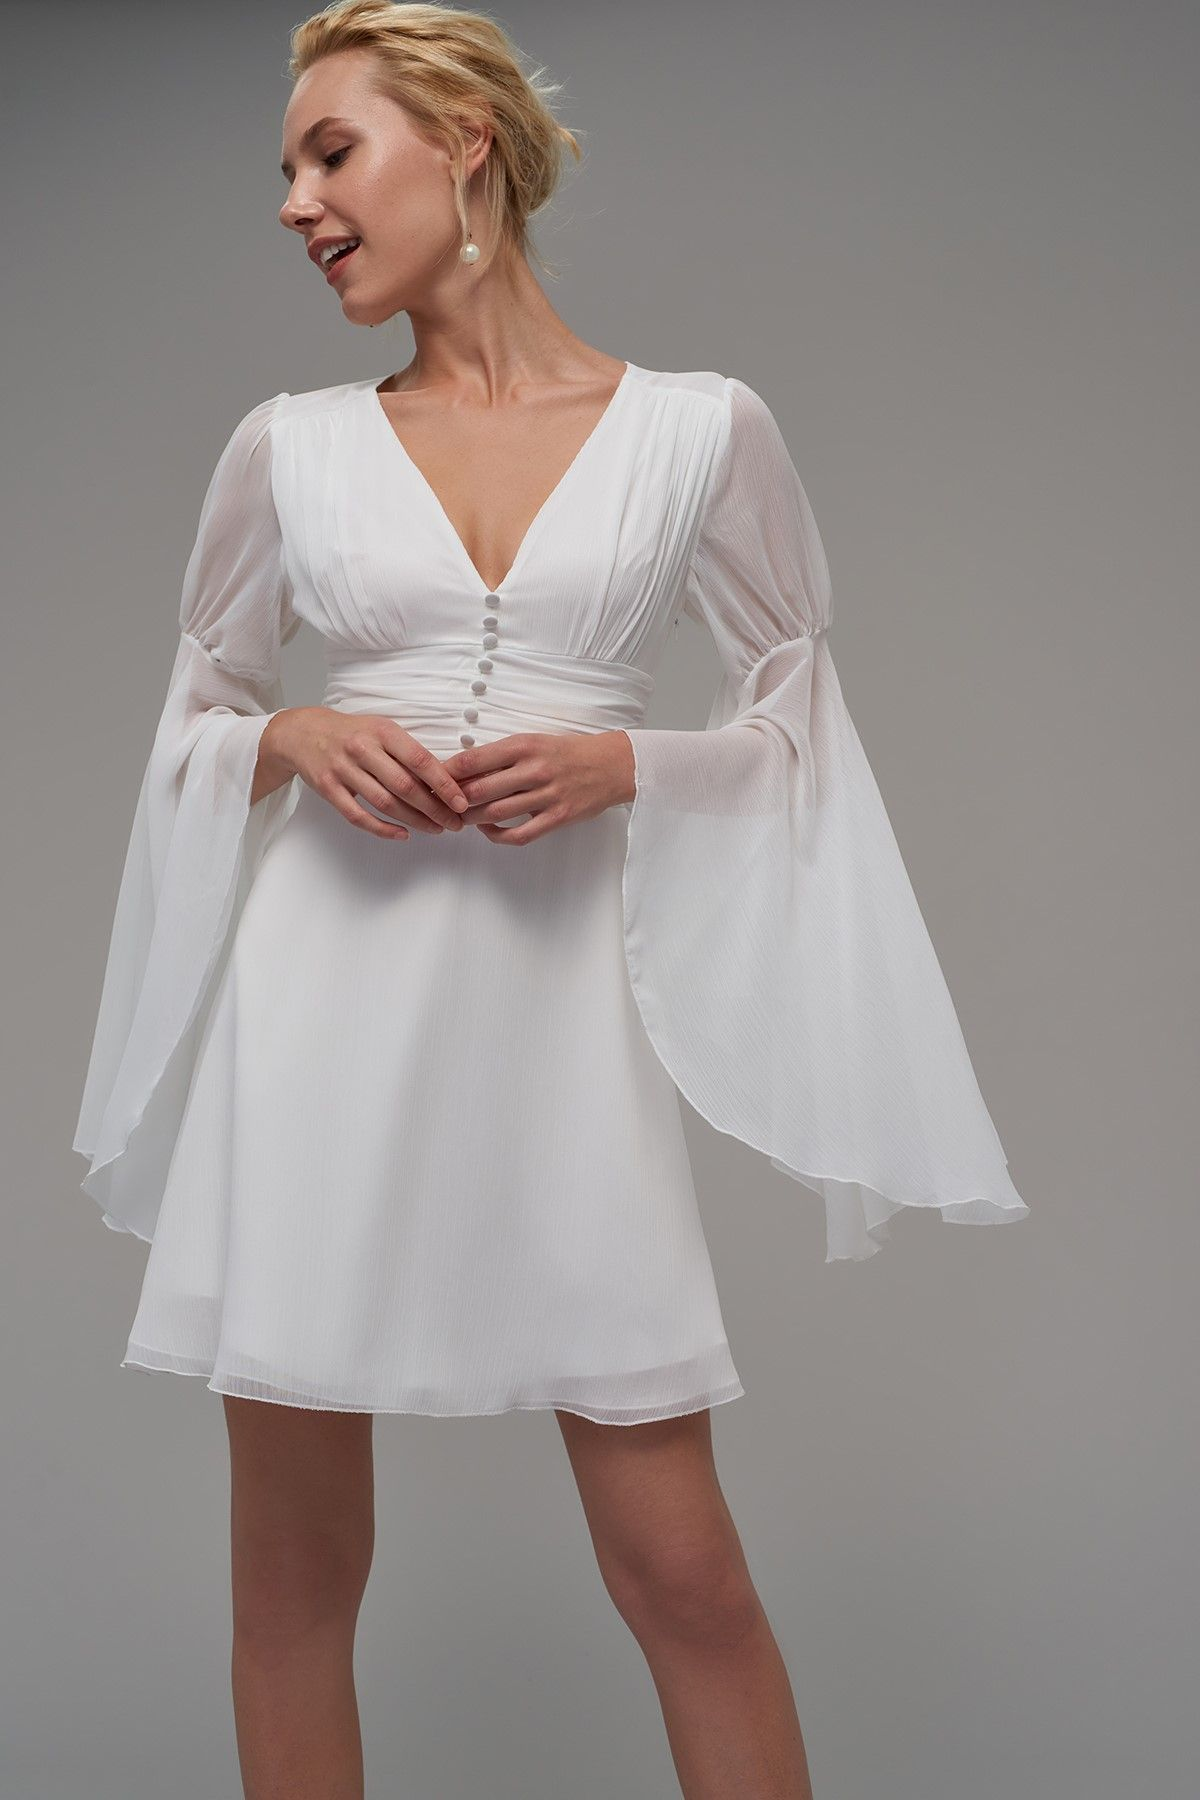 Ekru Beli Korsajli Elbise Trendyolmilla Trendyol Elbise The Dress Elbise Modelleri